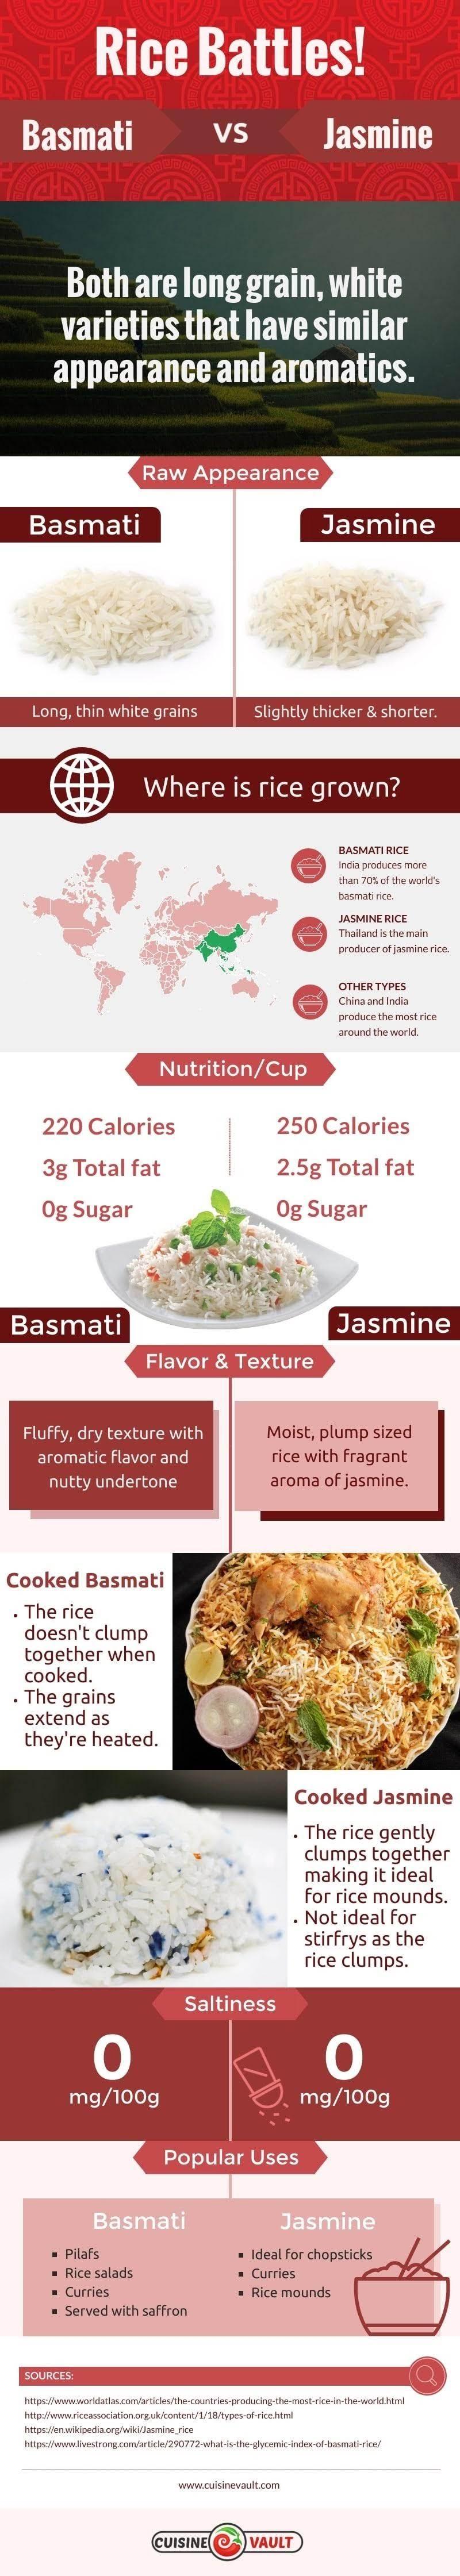 Rise Battles! Basmati Rice Vs Jasmine Rice #infographic